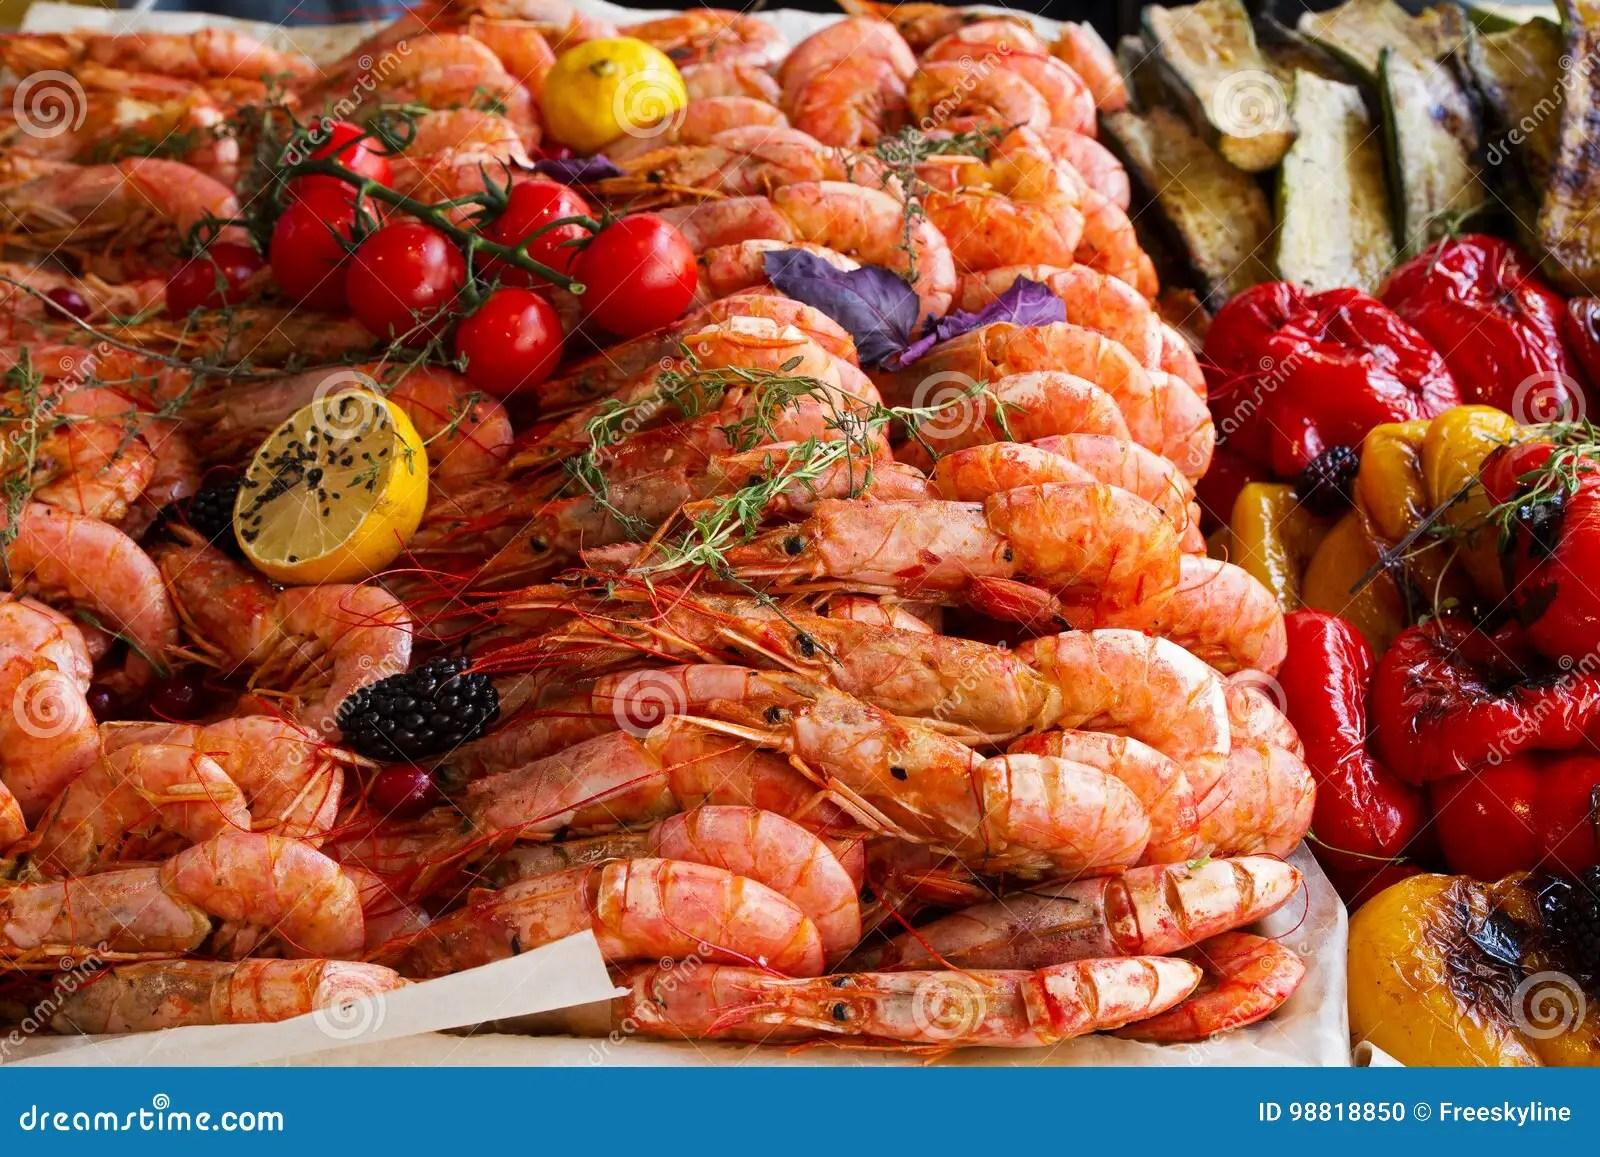 kitchen booths table for 8 烤大虾 在开放街道食物厨房国际食物节日事件的食物摊位服务的柠檬和菜 在开放街道食物厨房国际食物节日事件的食物摊位